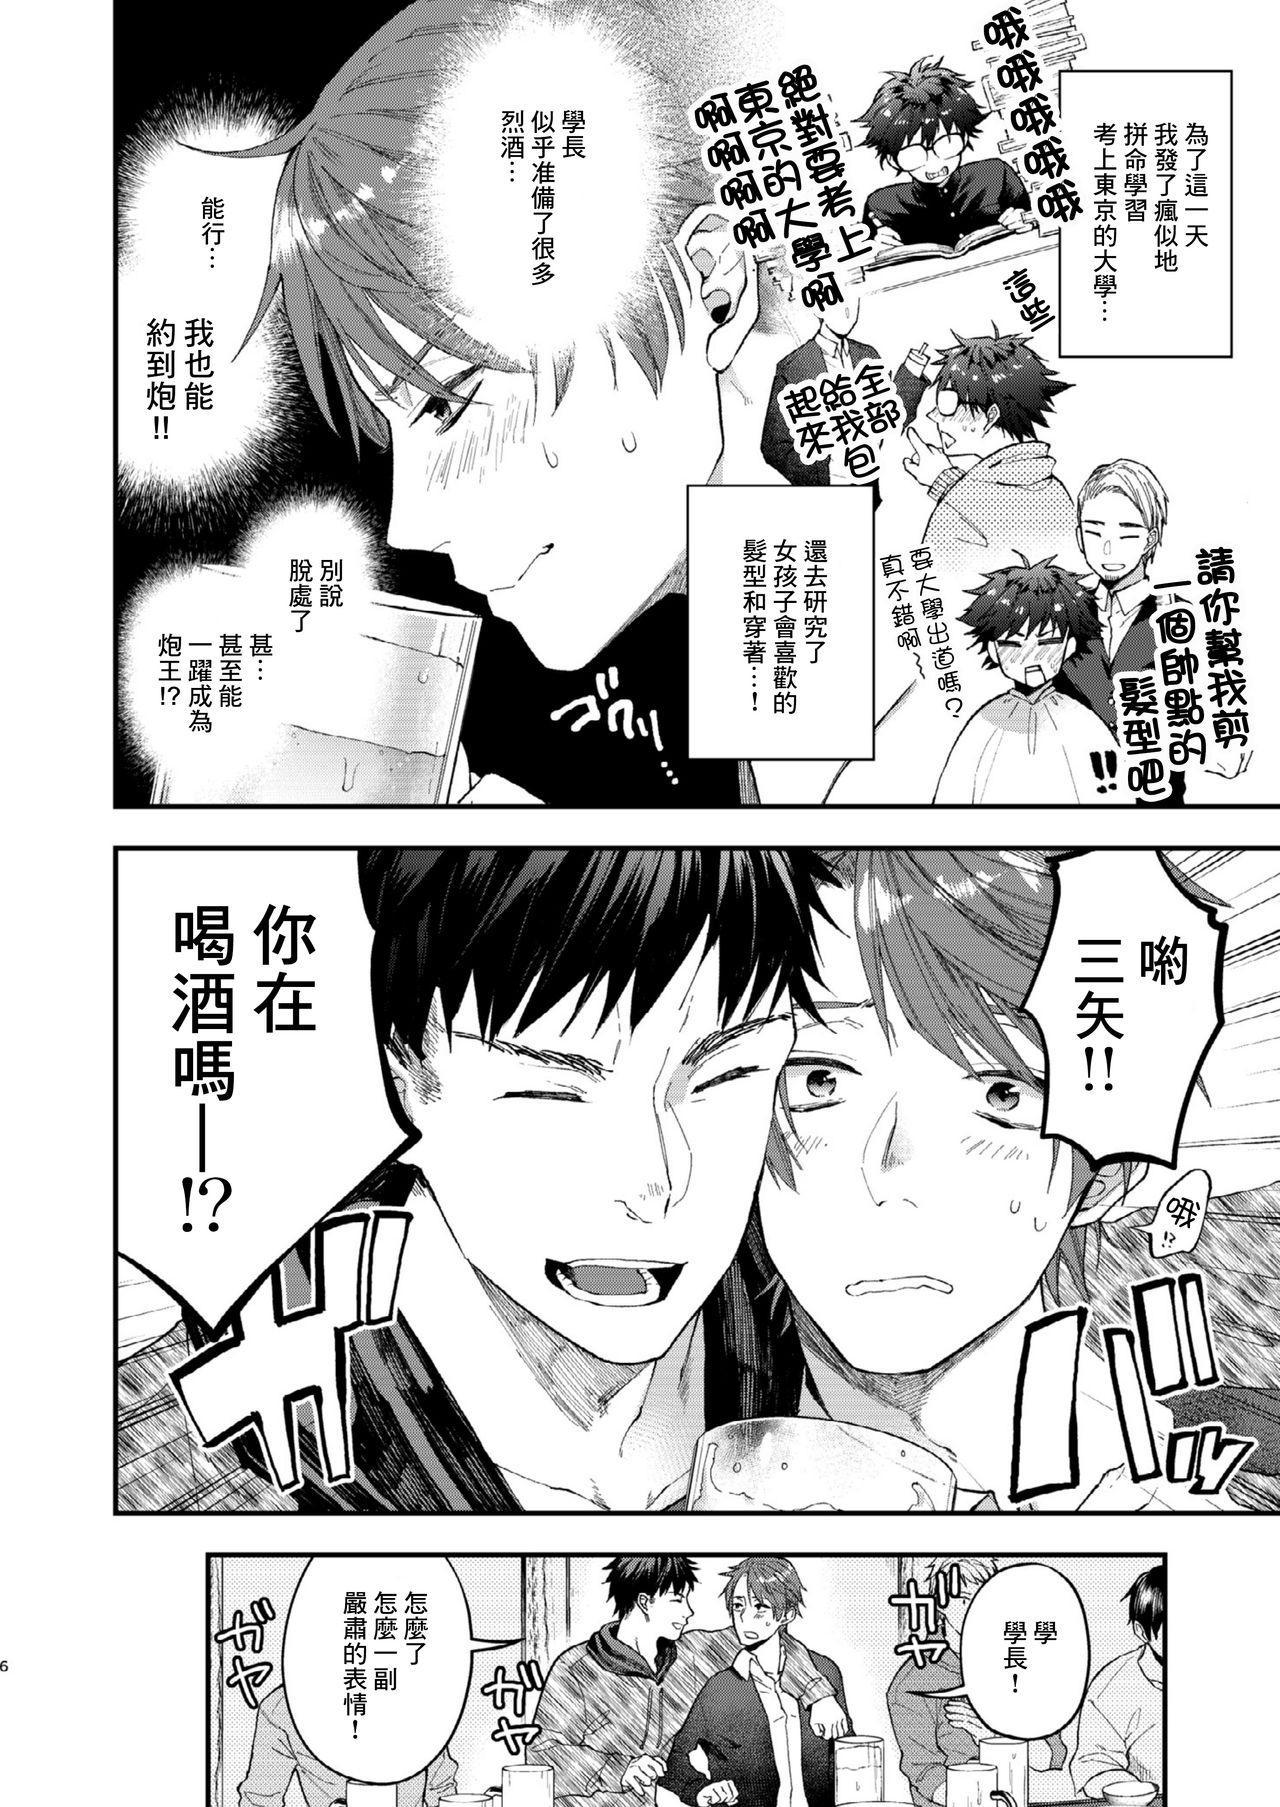 Tonde Hiniiru Yarimokonke   跳入火坑的约炮直男 3